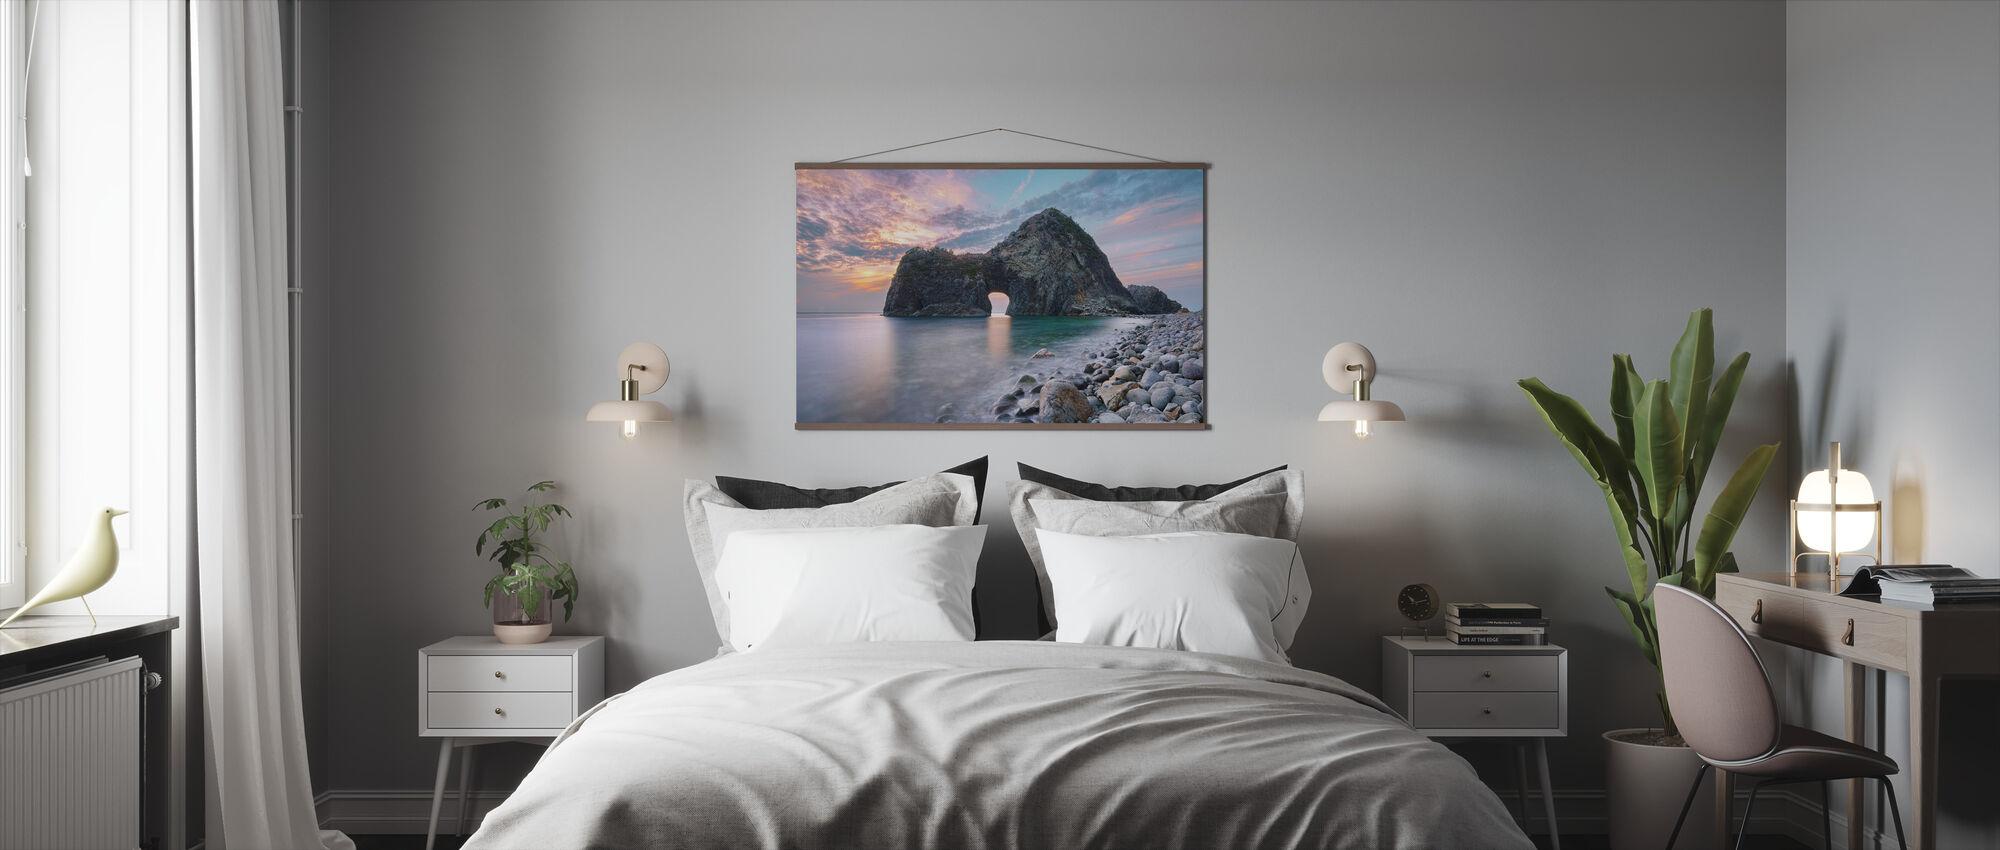 Rock Gate Senganmon - Poster - Slaapkamer